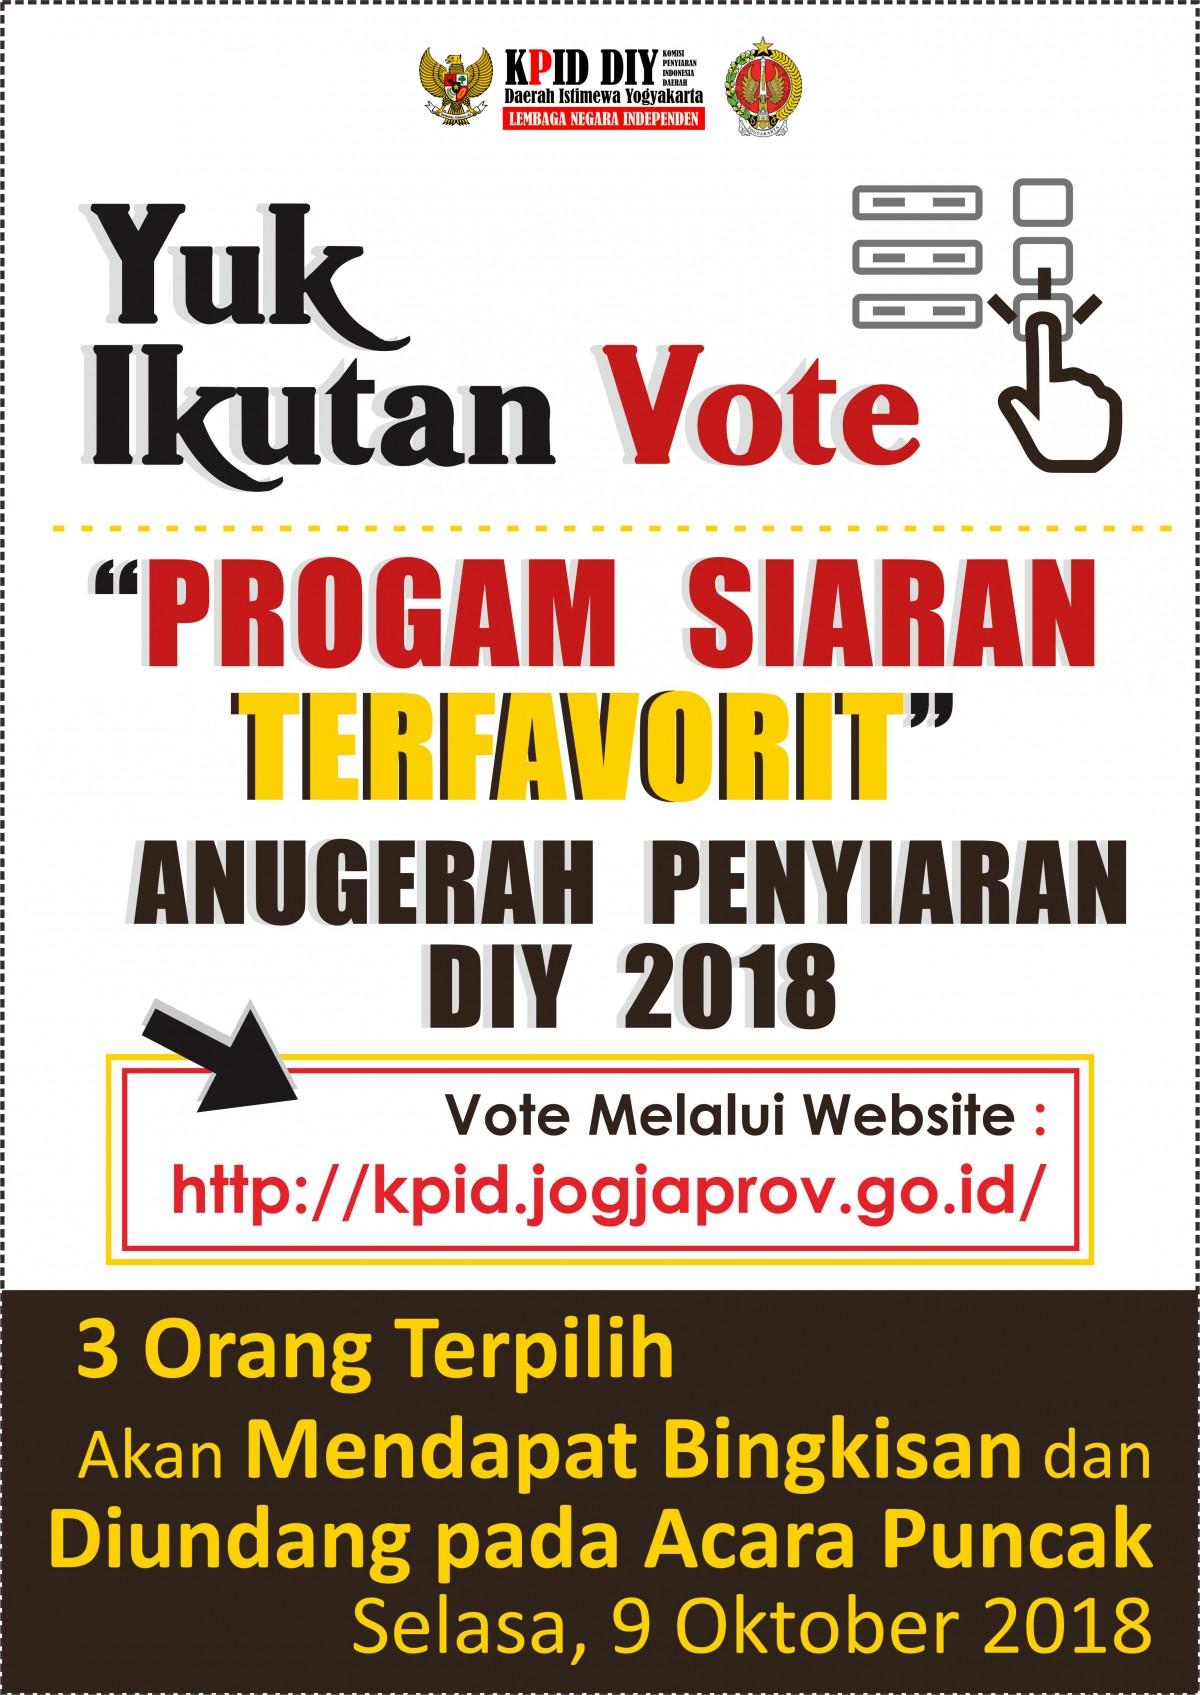 Yuk Voting Program Acara TV/Radio Favoritmu !